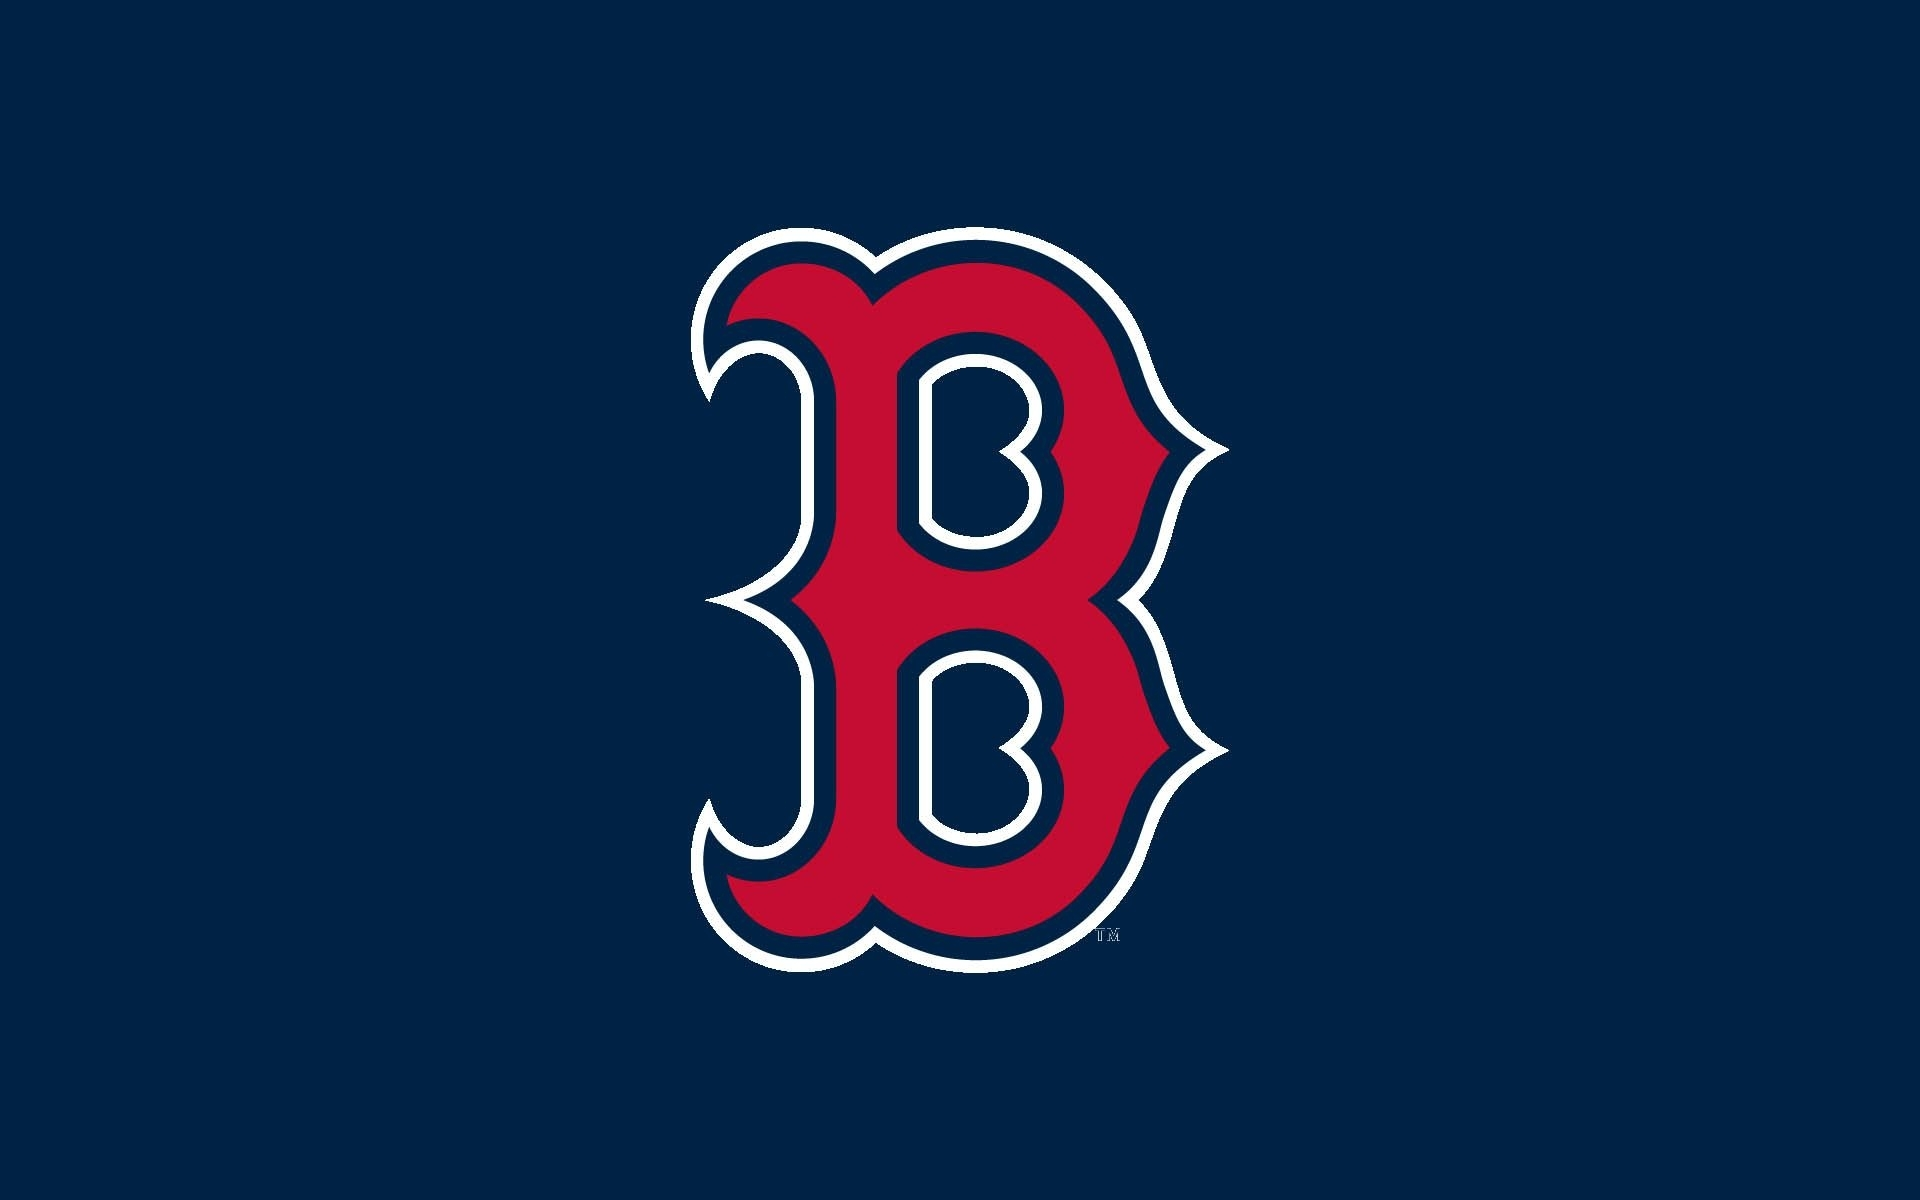 boston red sox logo wallpaper collection (49+)